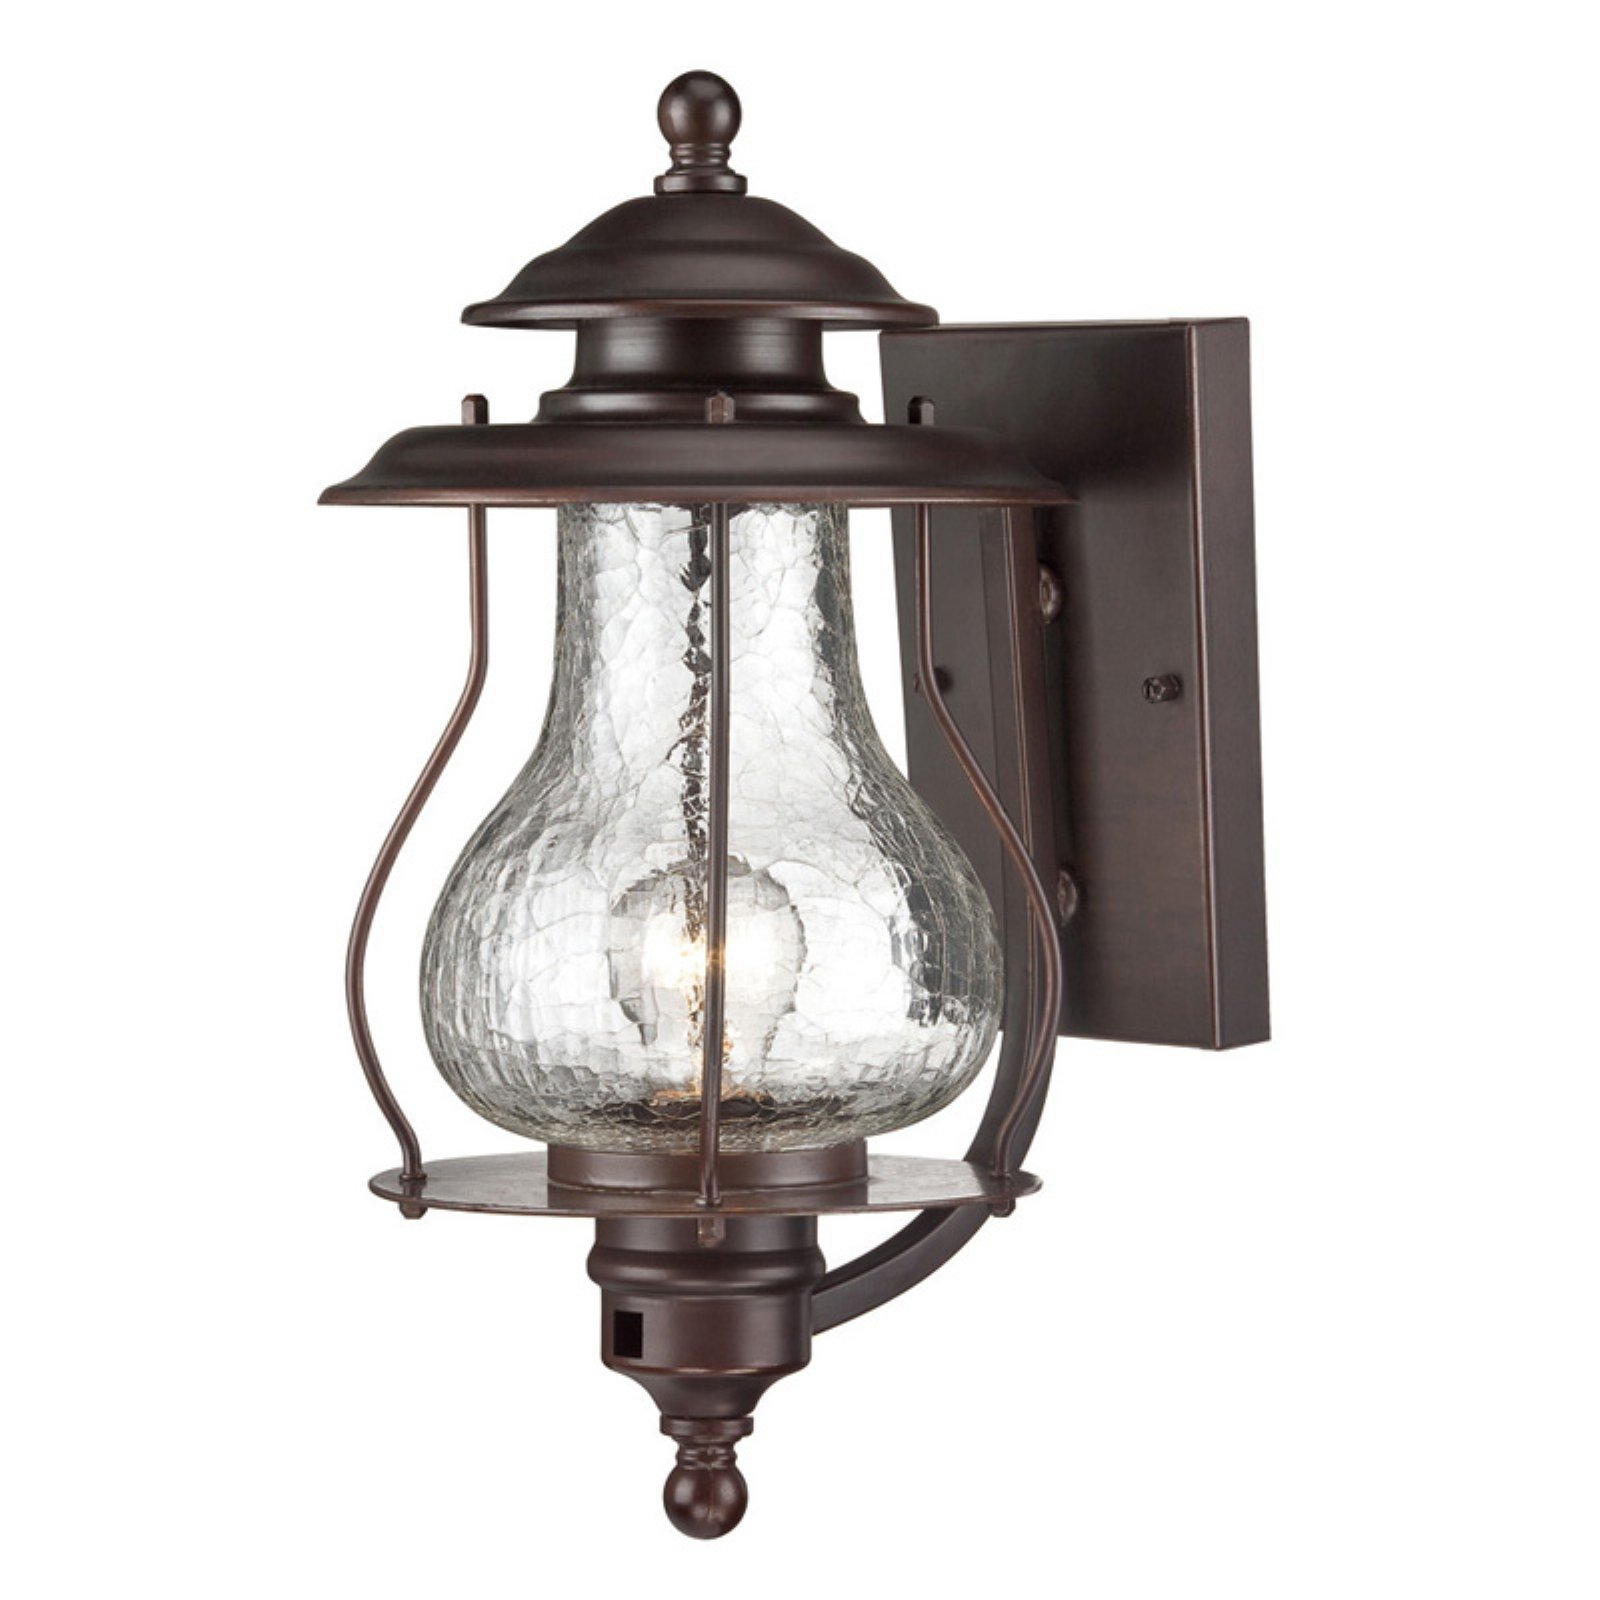 Acclaim Lighting Blue Ridge Outdoor Wall Mount Light Fixture